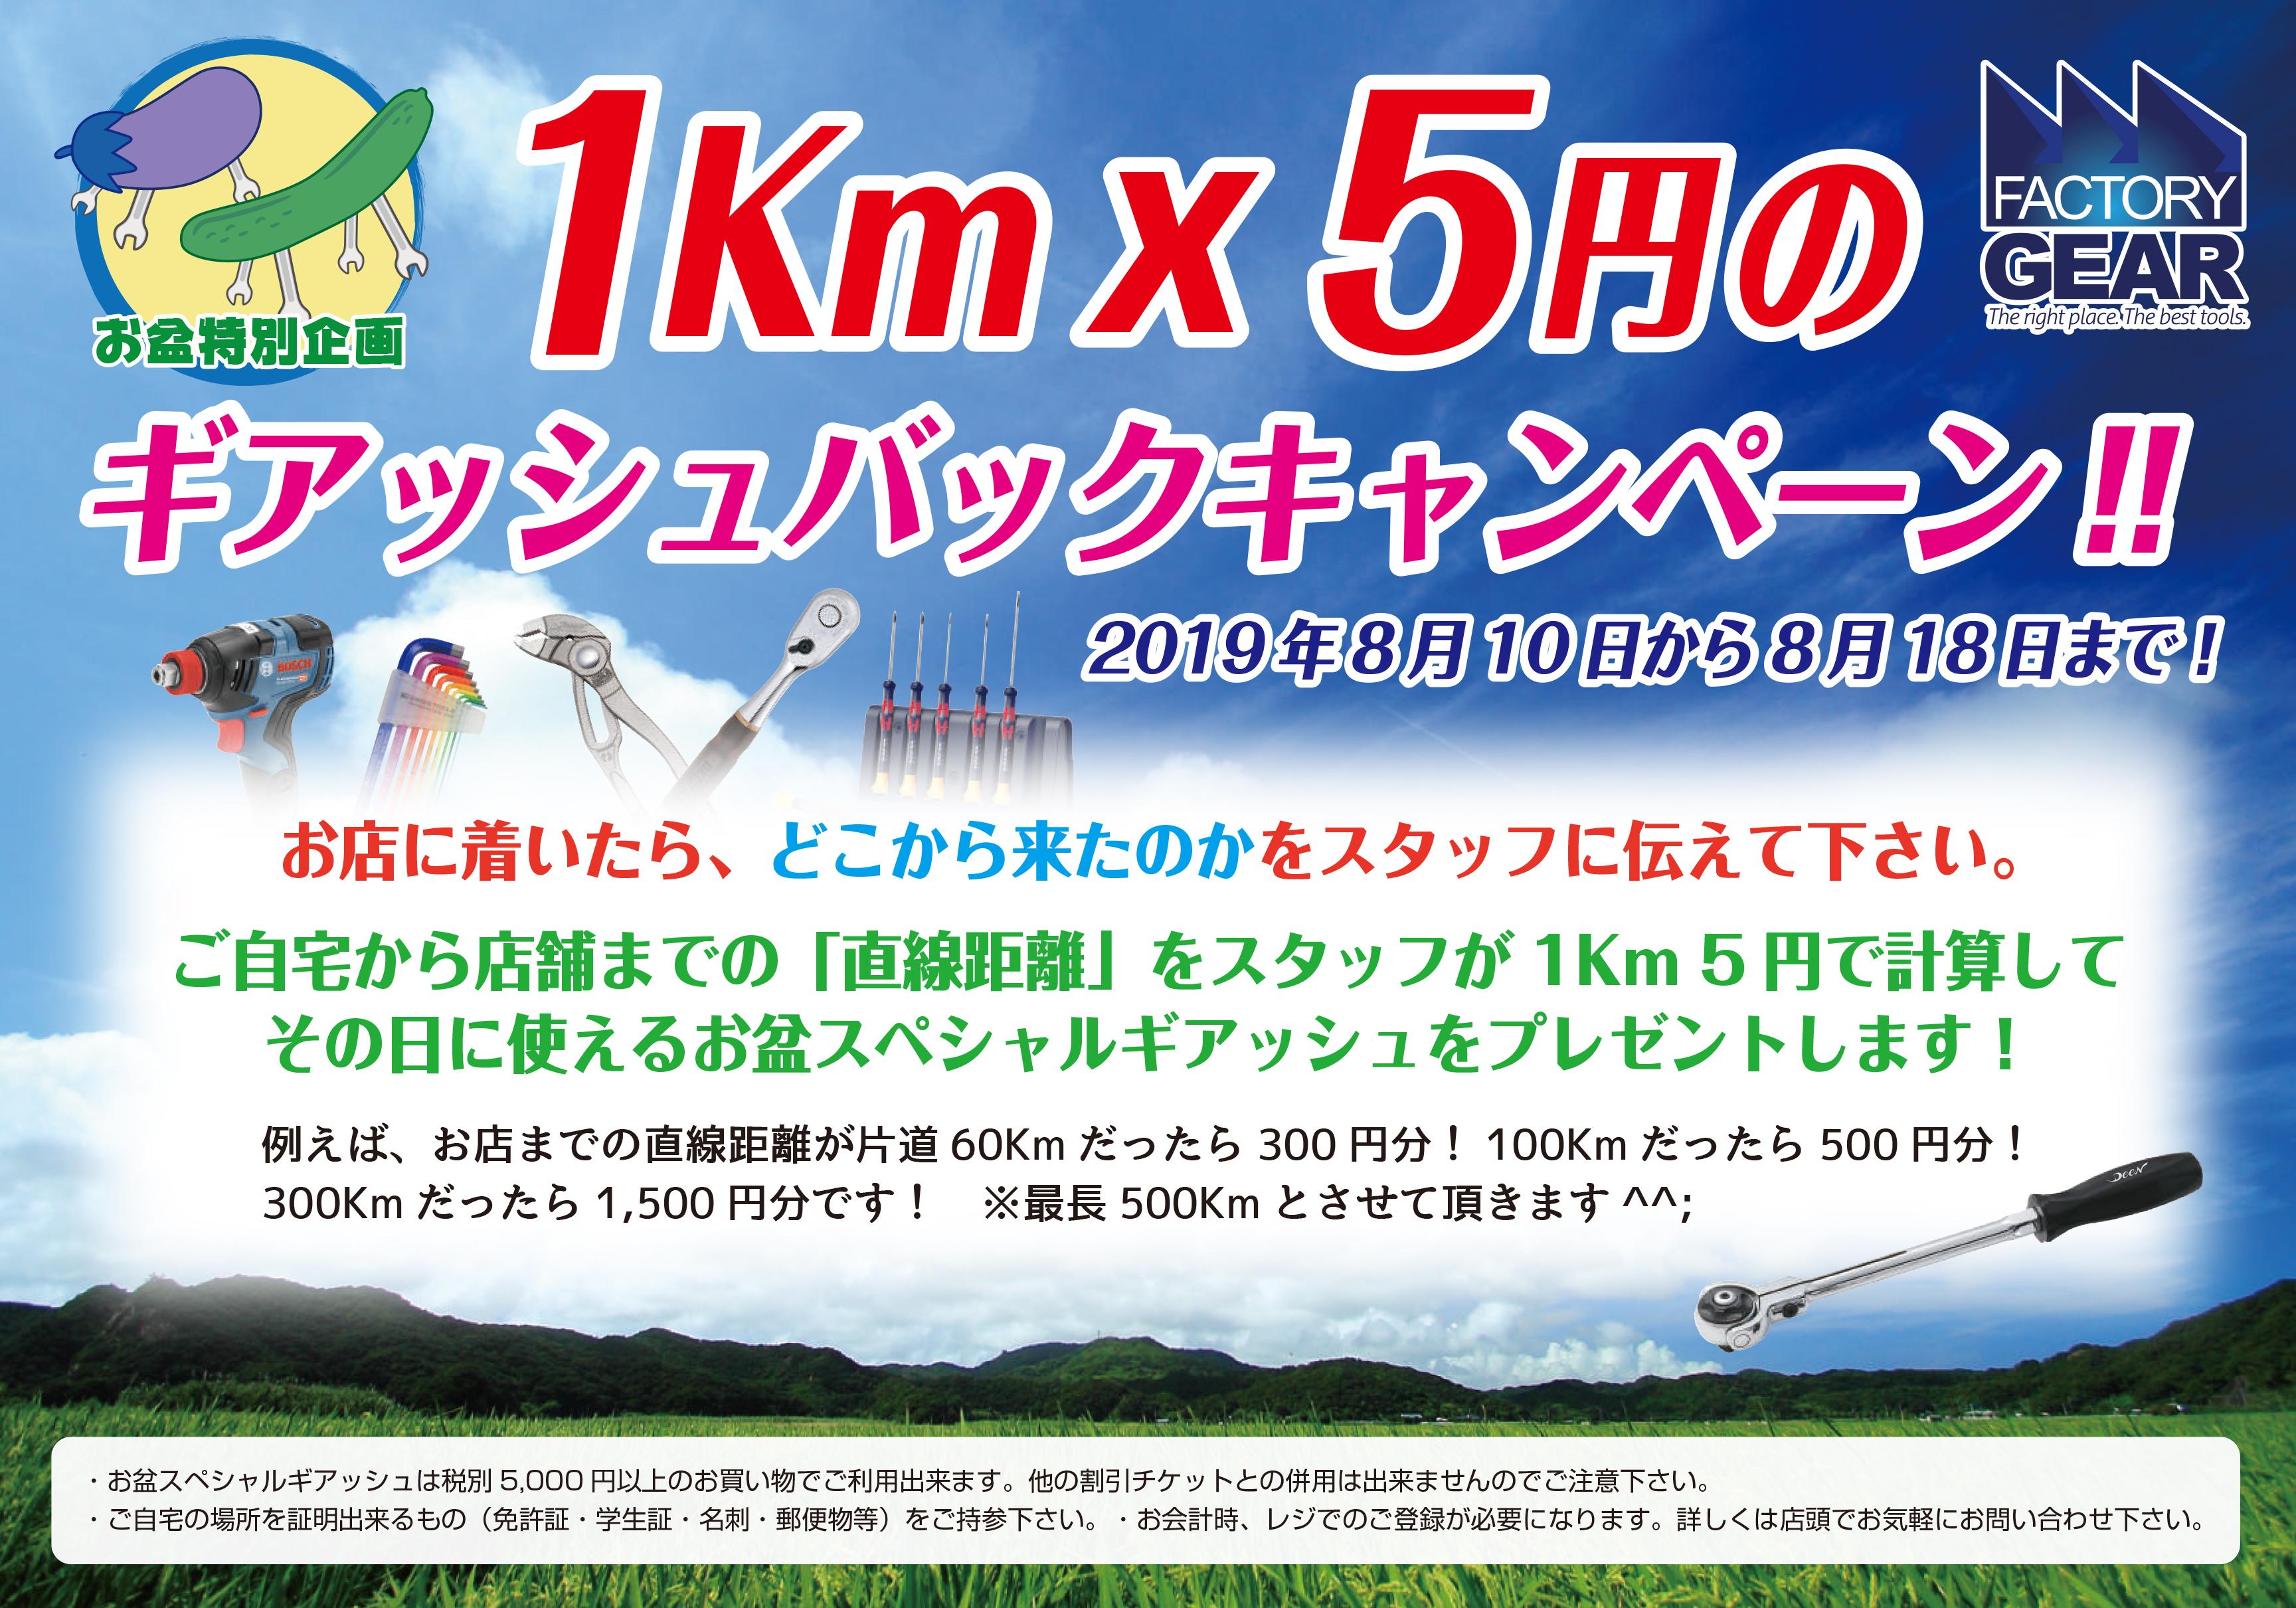 201908_1Km5円-圧縮済み